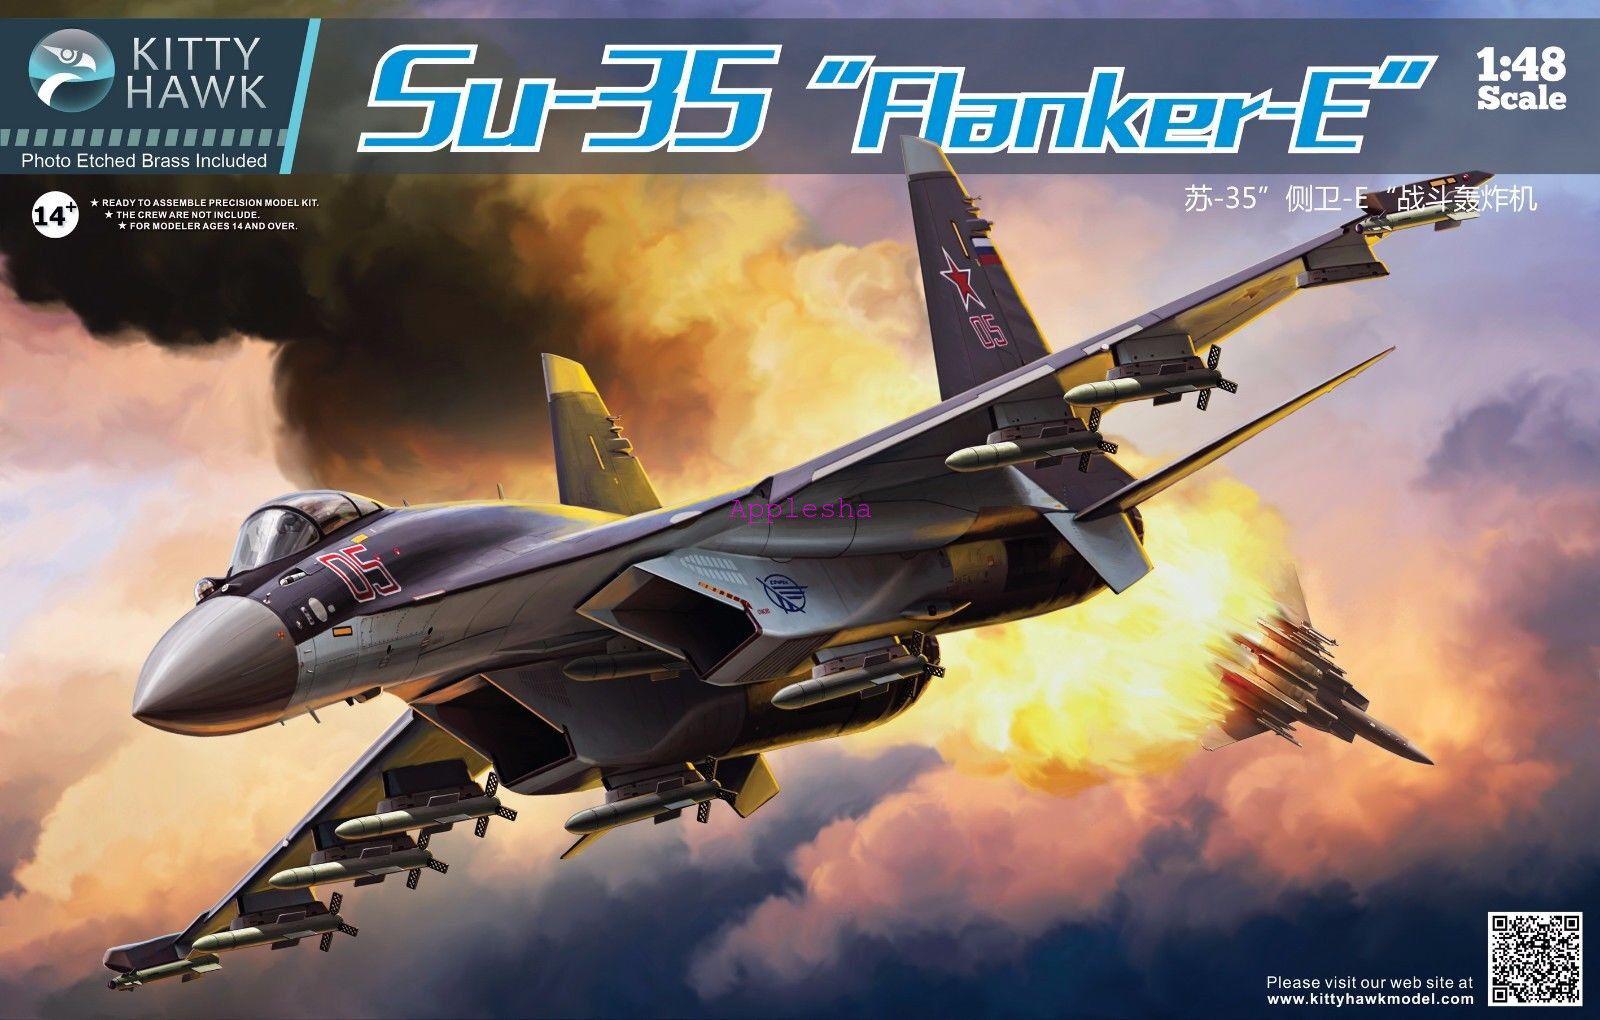 Kitty Hawk 80142 1 48 Su-35 Flanker E New